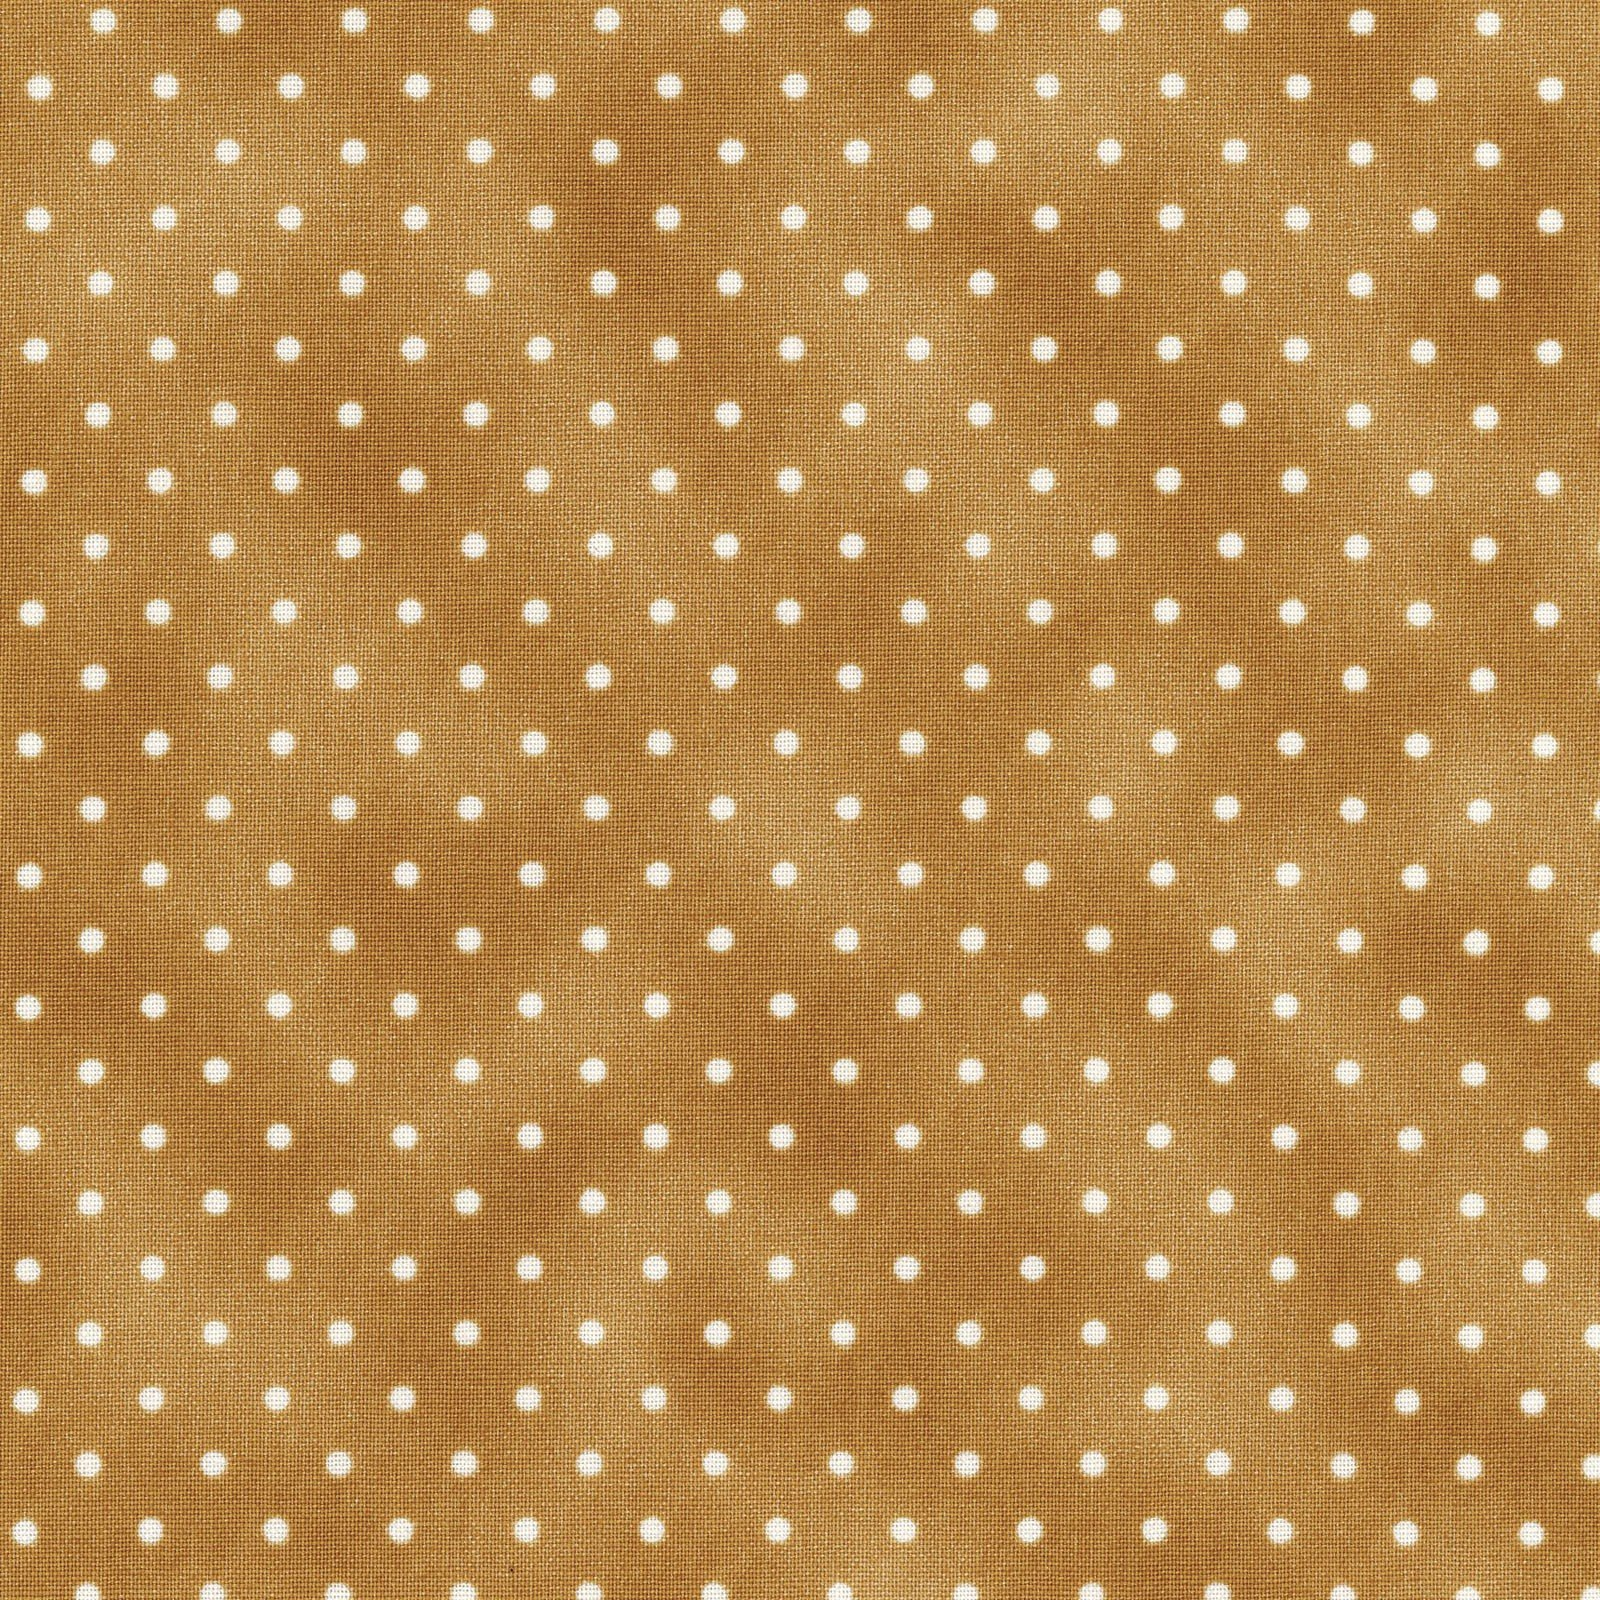 Pin Dots - Golden Brown<br/>Maywood Studio 609-S2